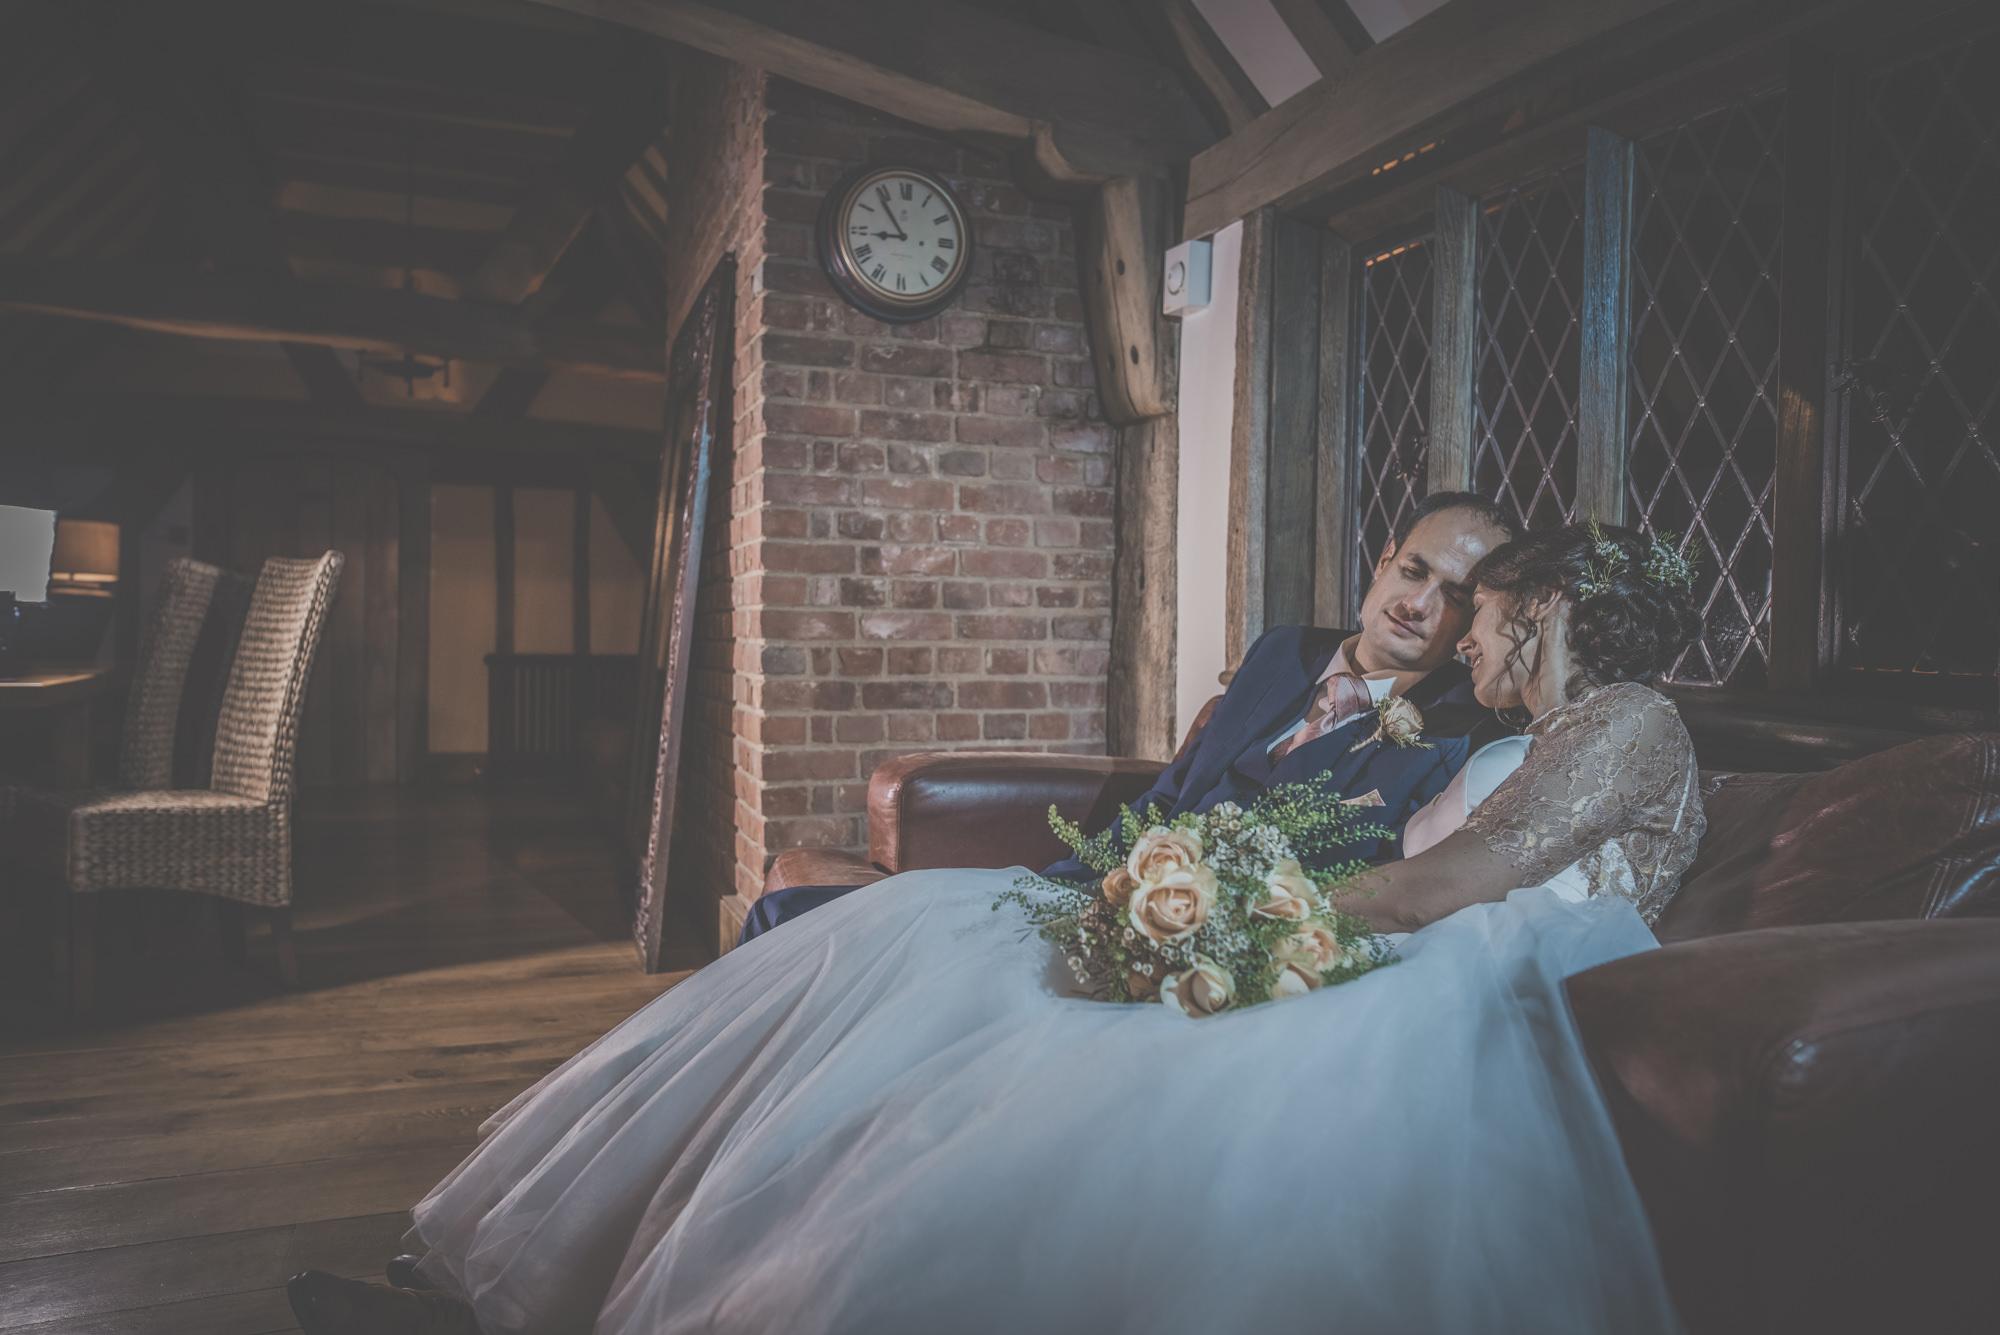 Charisse-and-James-wedding-in-Cain-Manor-Venue-Hampshire-Manu-Mendoza-Wedding-Photography-524.jpg